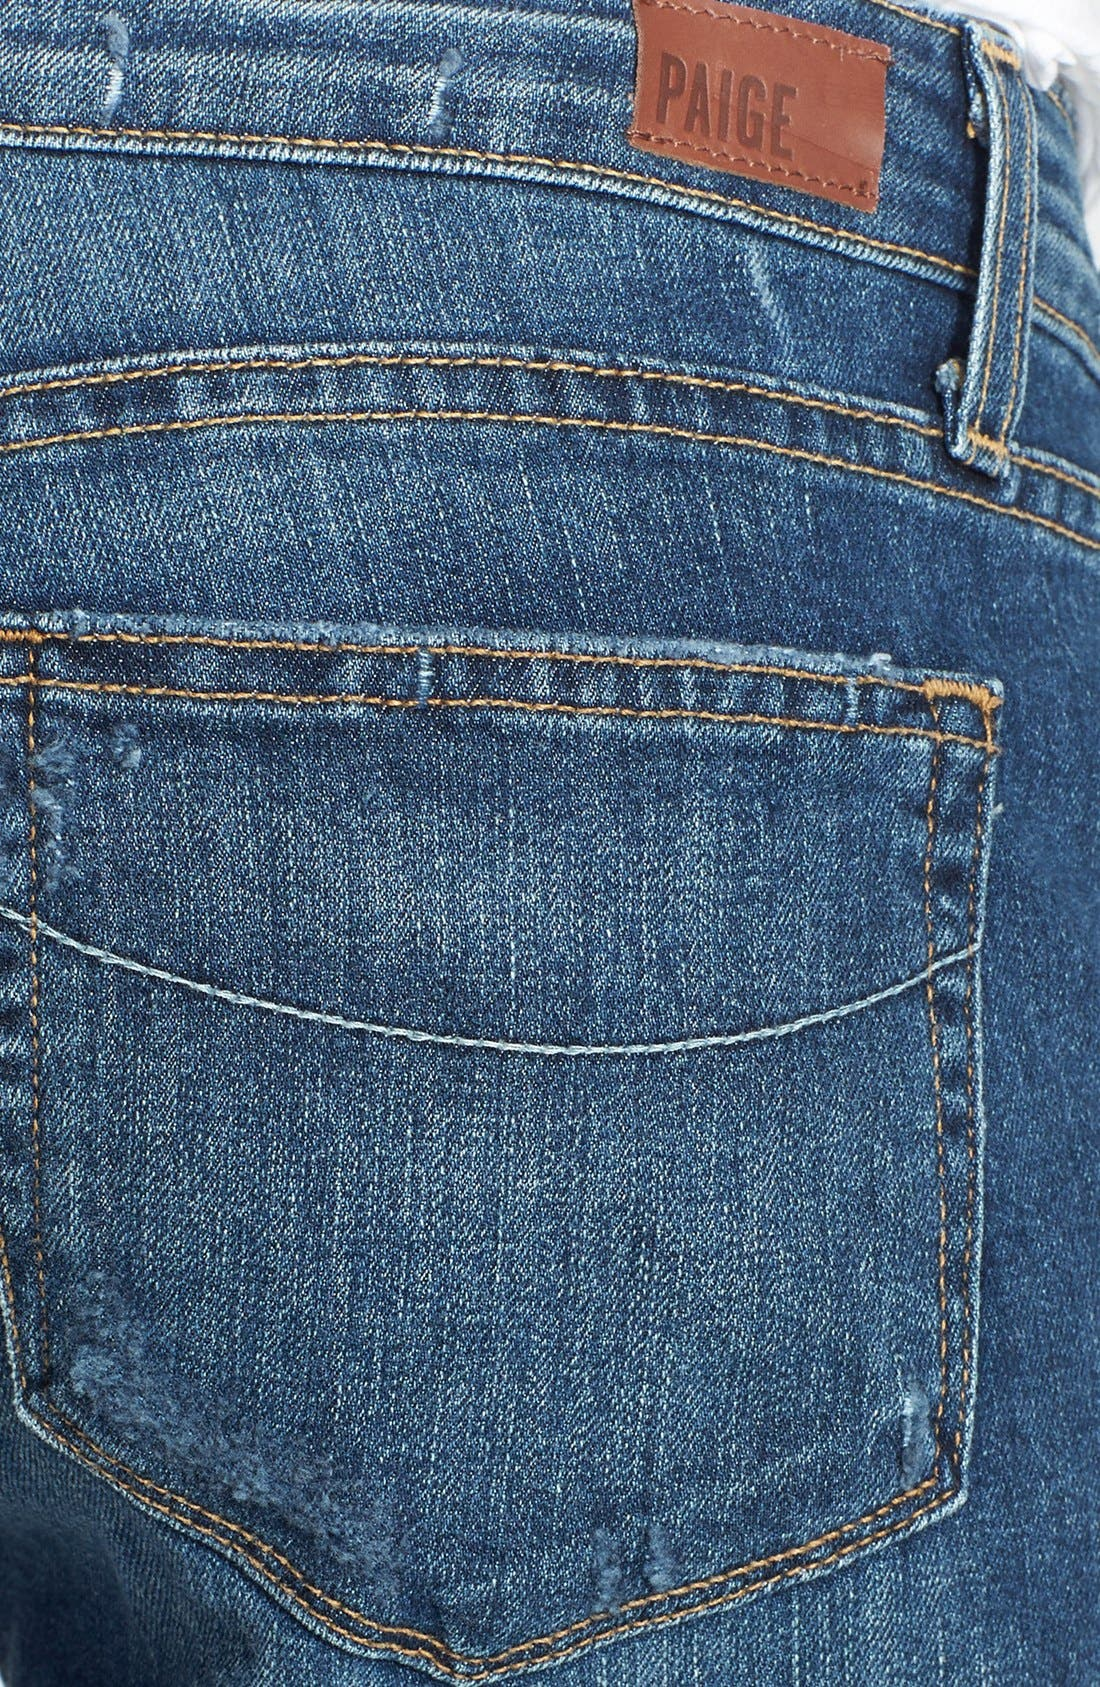 Alternate Image 3  - Paige Denim 'Jimmy Jimmy' Distressed Crop Jeans (Luca)